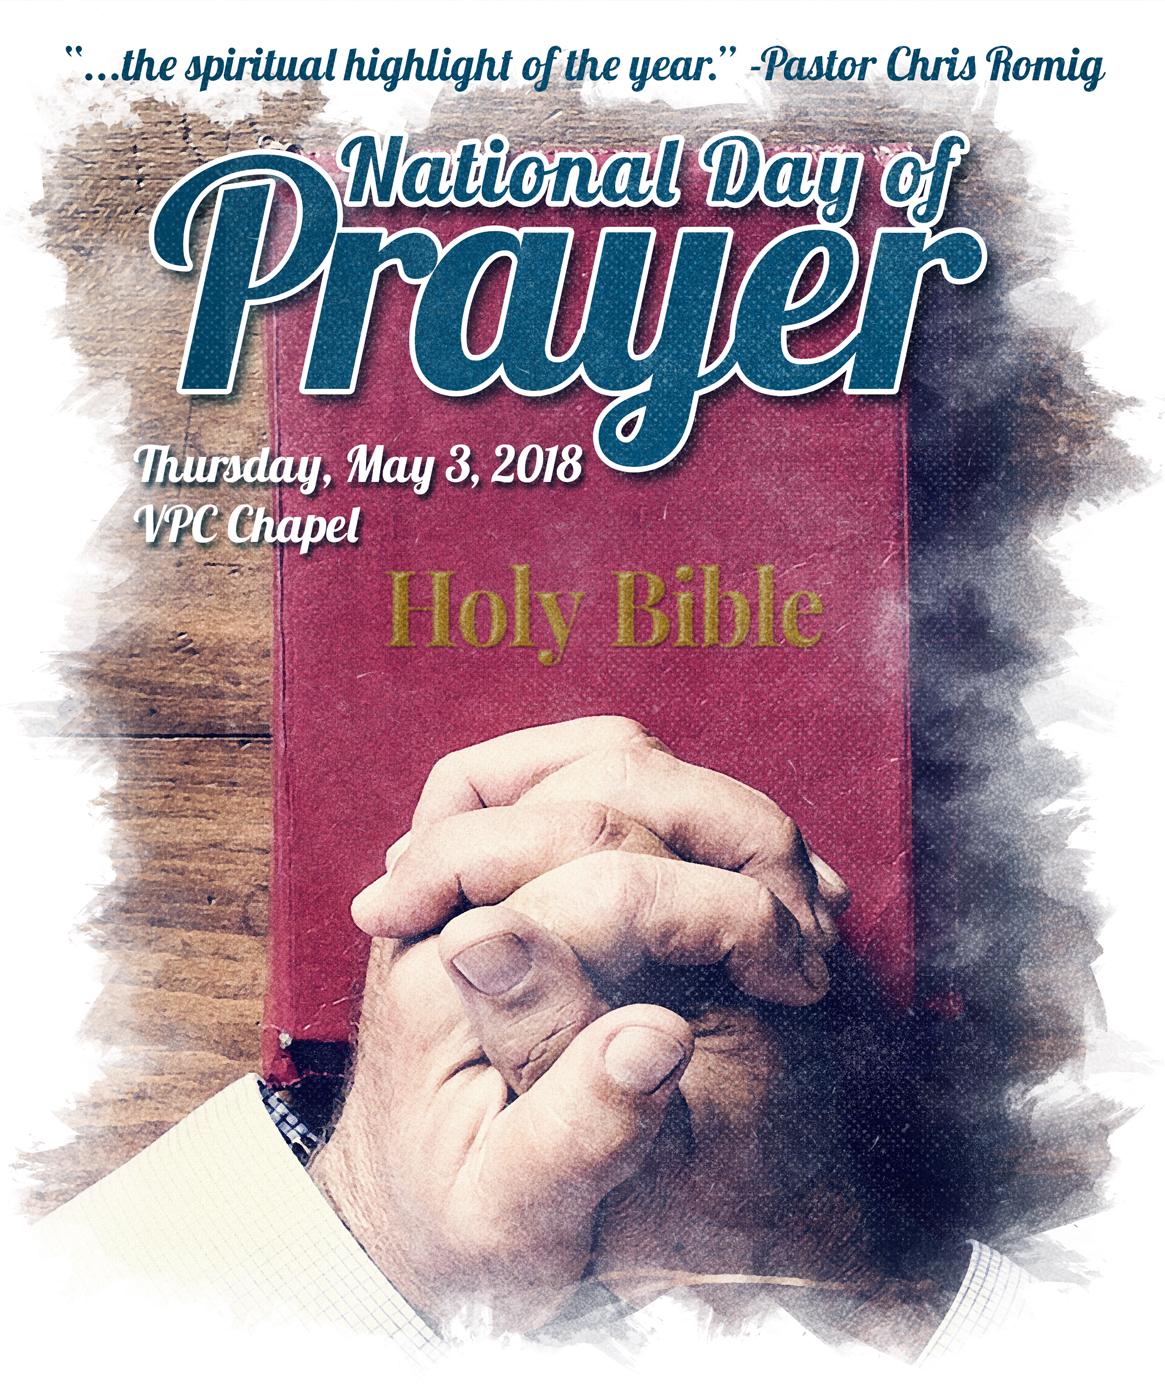 national-day-of-prayer-image.jpg